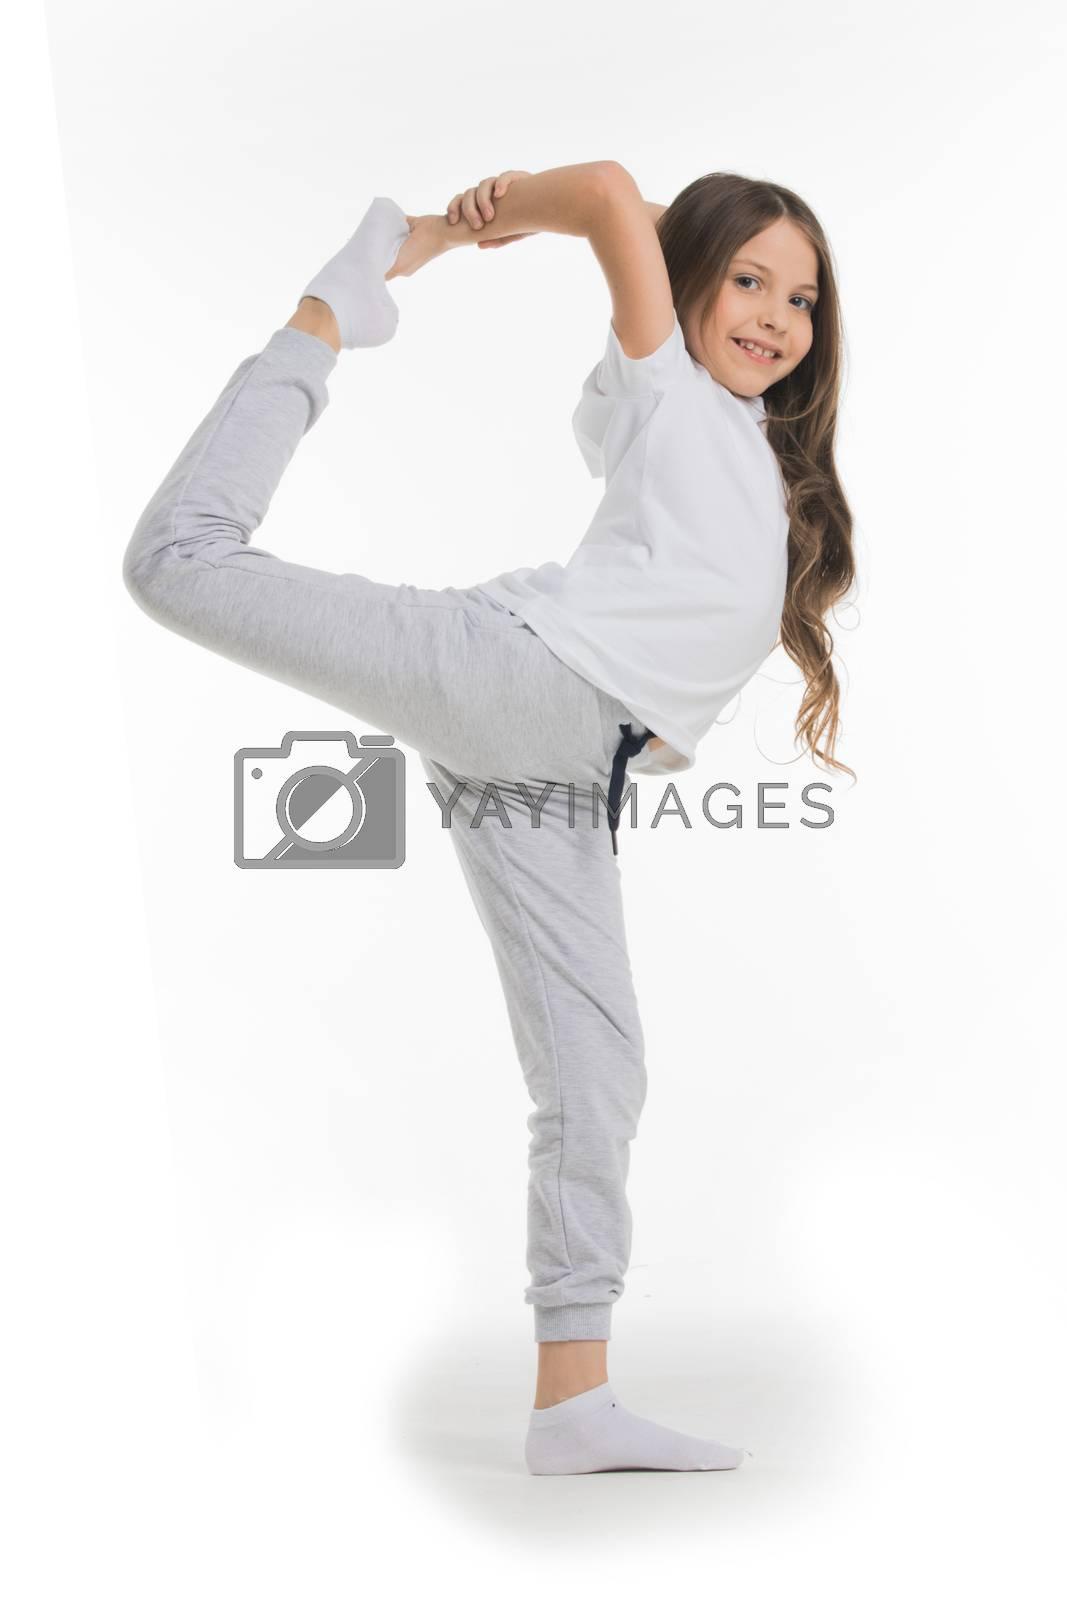 Yoga pose, girl standing stretching legs, leg split isolated on white background